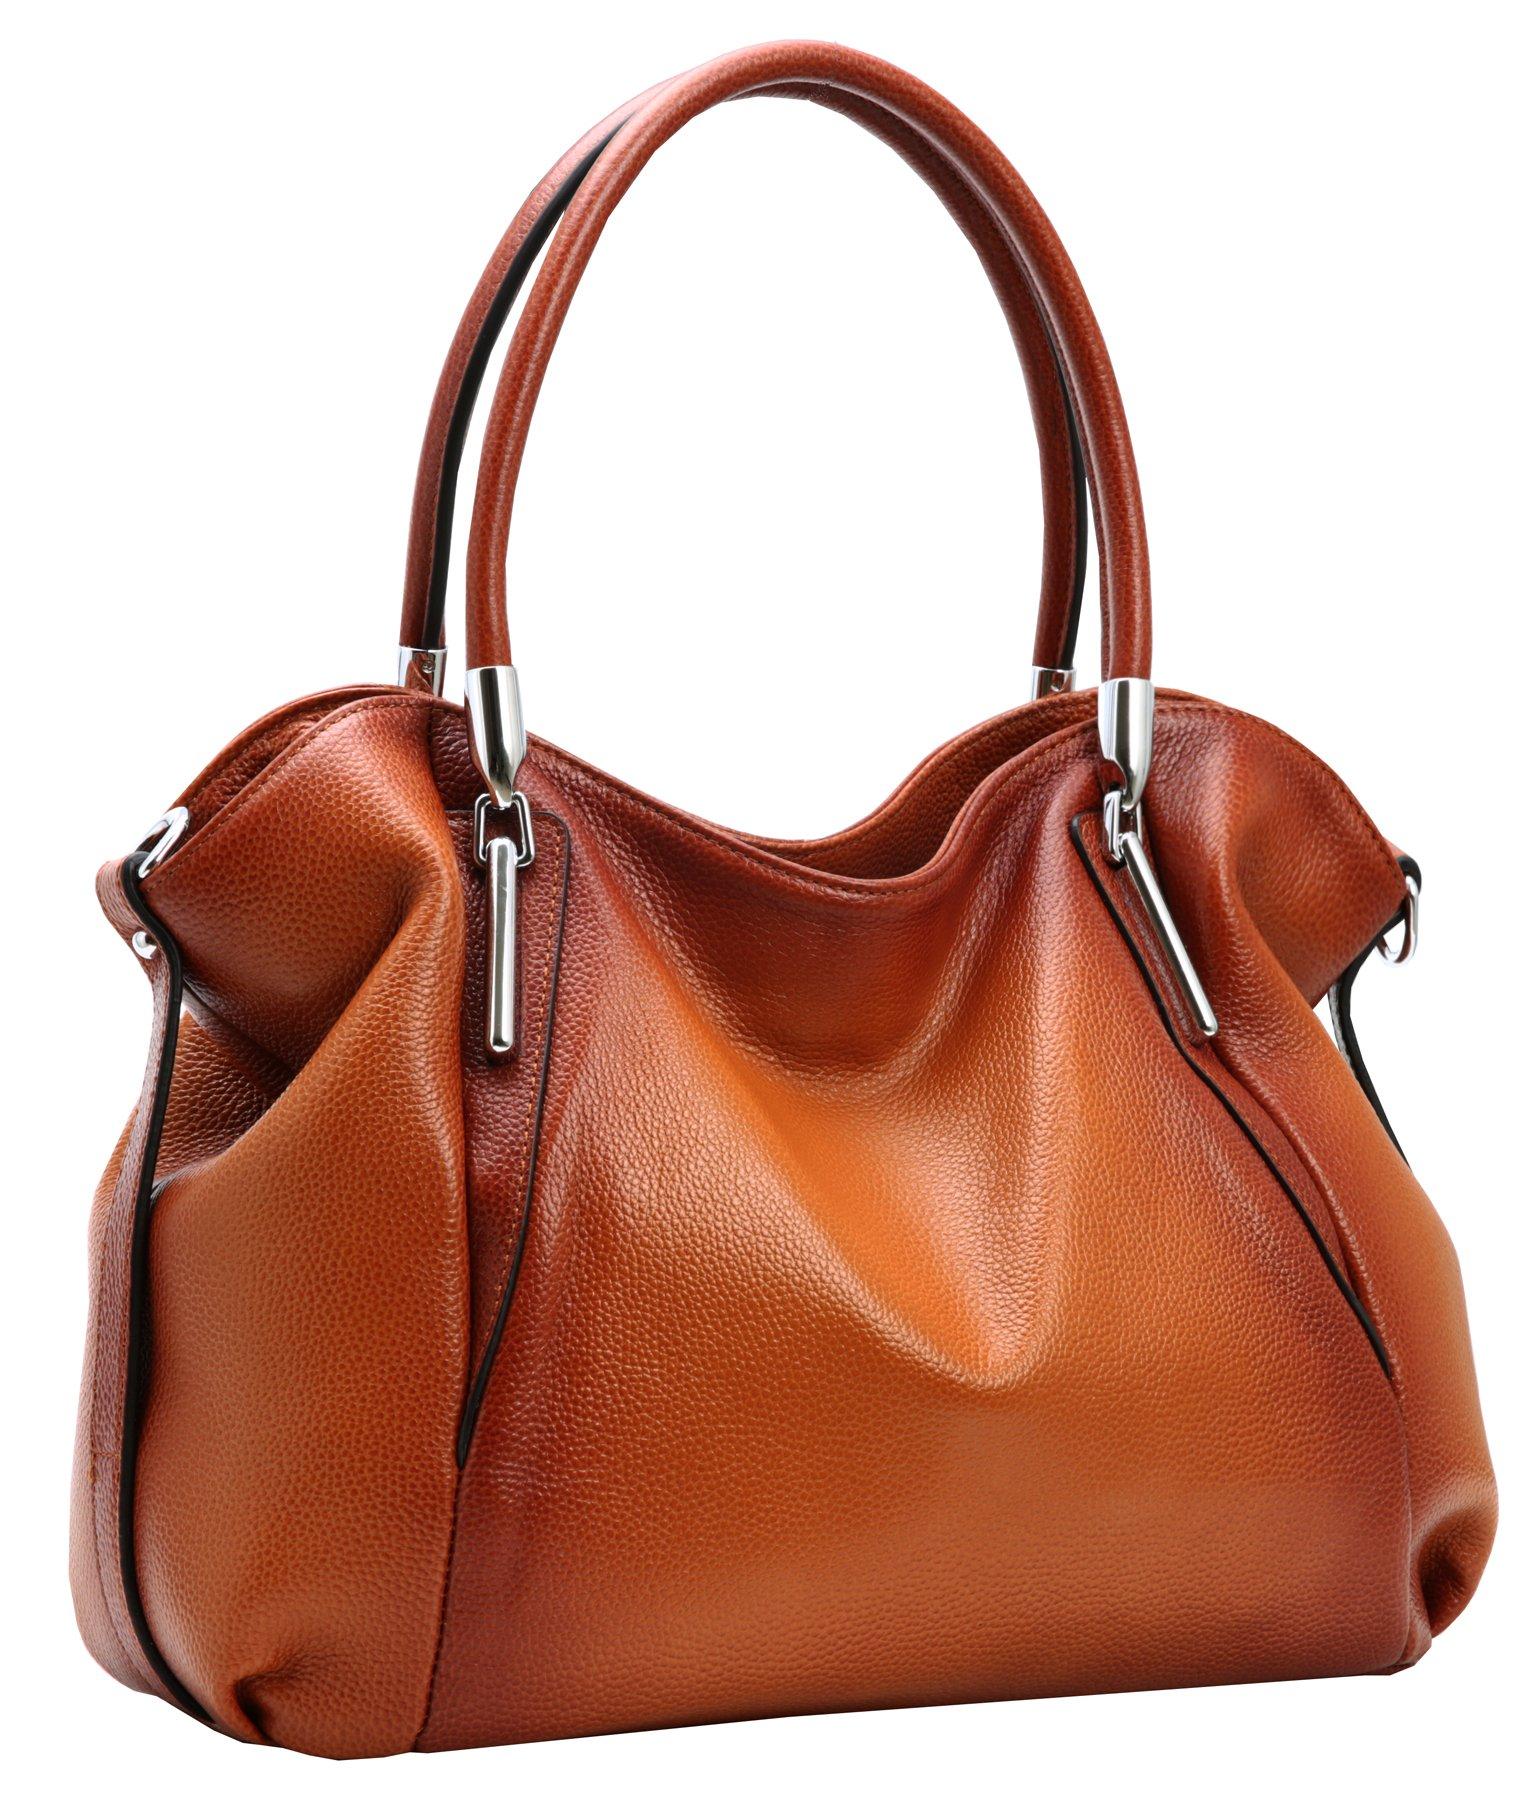 HESHE Womens Leather Handbags Tote Bag Top Handle Bag Hobo Shoulder Handbag Designer Ladies Purse Cross Body Bag (Sorrel)